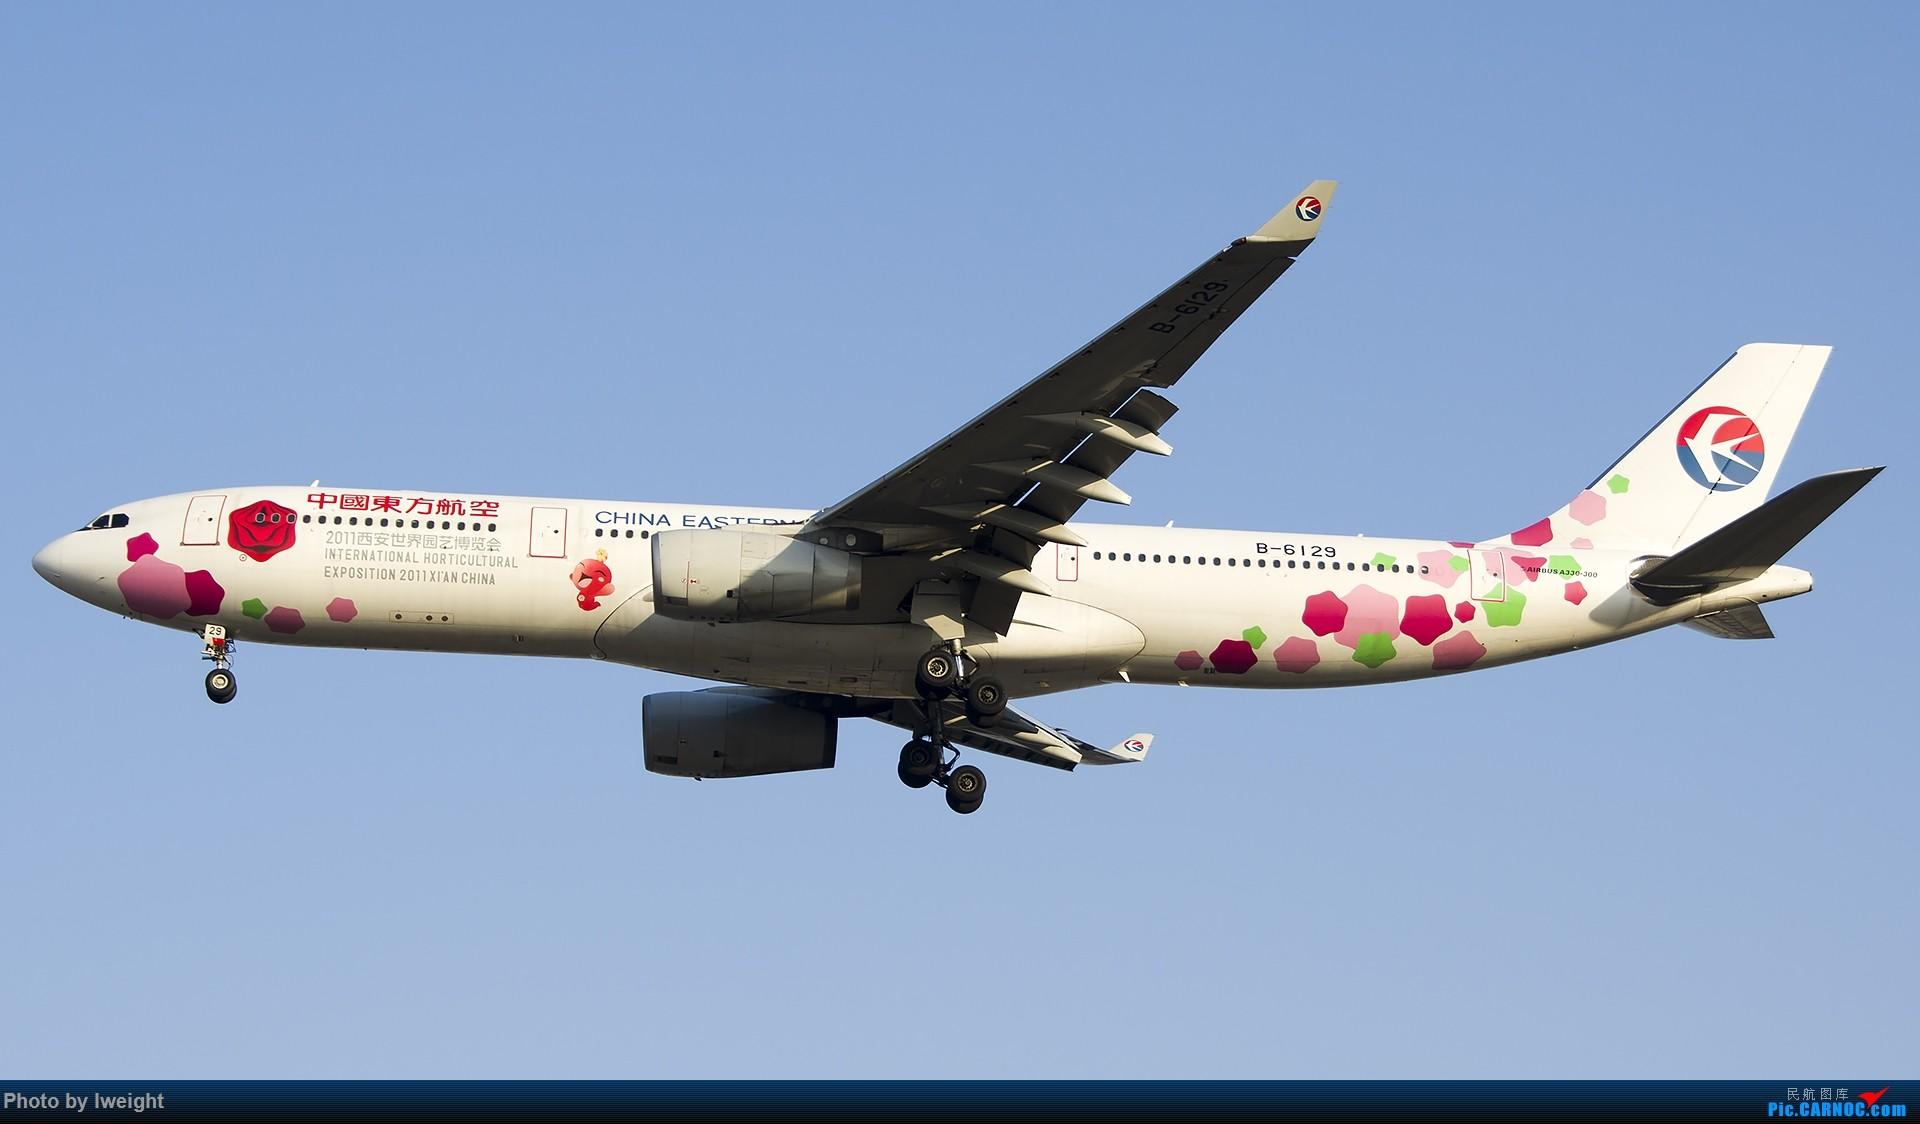 Re:[原创]庆祝升级777,发上今天在首都机场拍的所有飞机【2014-12-14】 AIRBUS A330-300 B-6129 中国北京首都国际机场